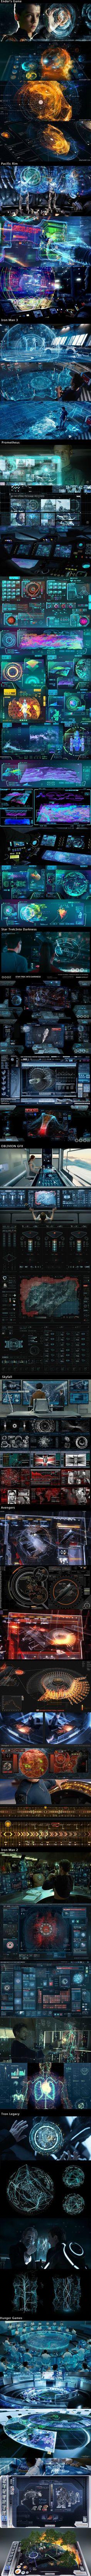 UI IxD SciFi Interface n' Design [] User Interface [Ender's Game | Pacific Rim | Prometheus | IronMan3]: